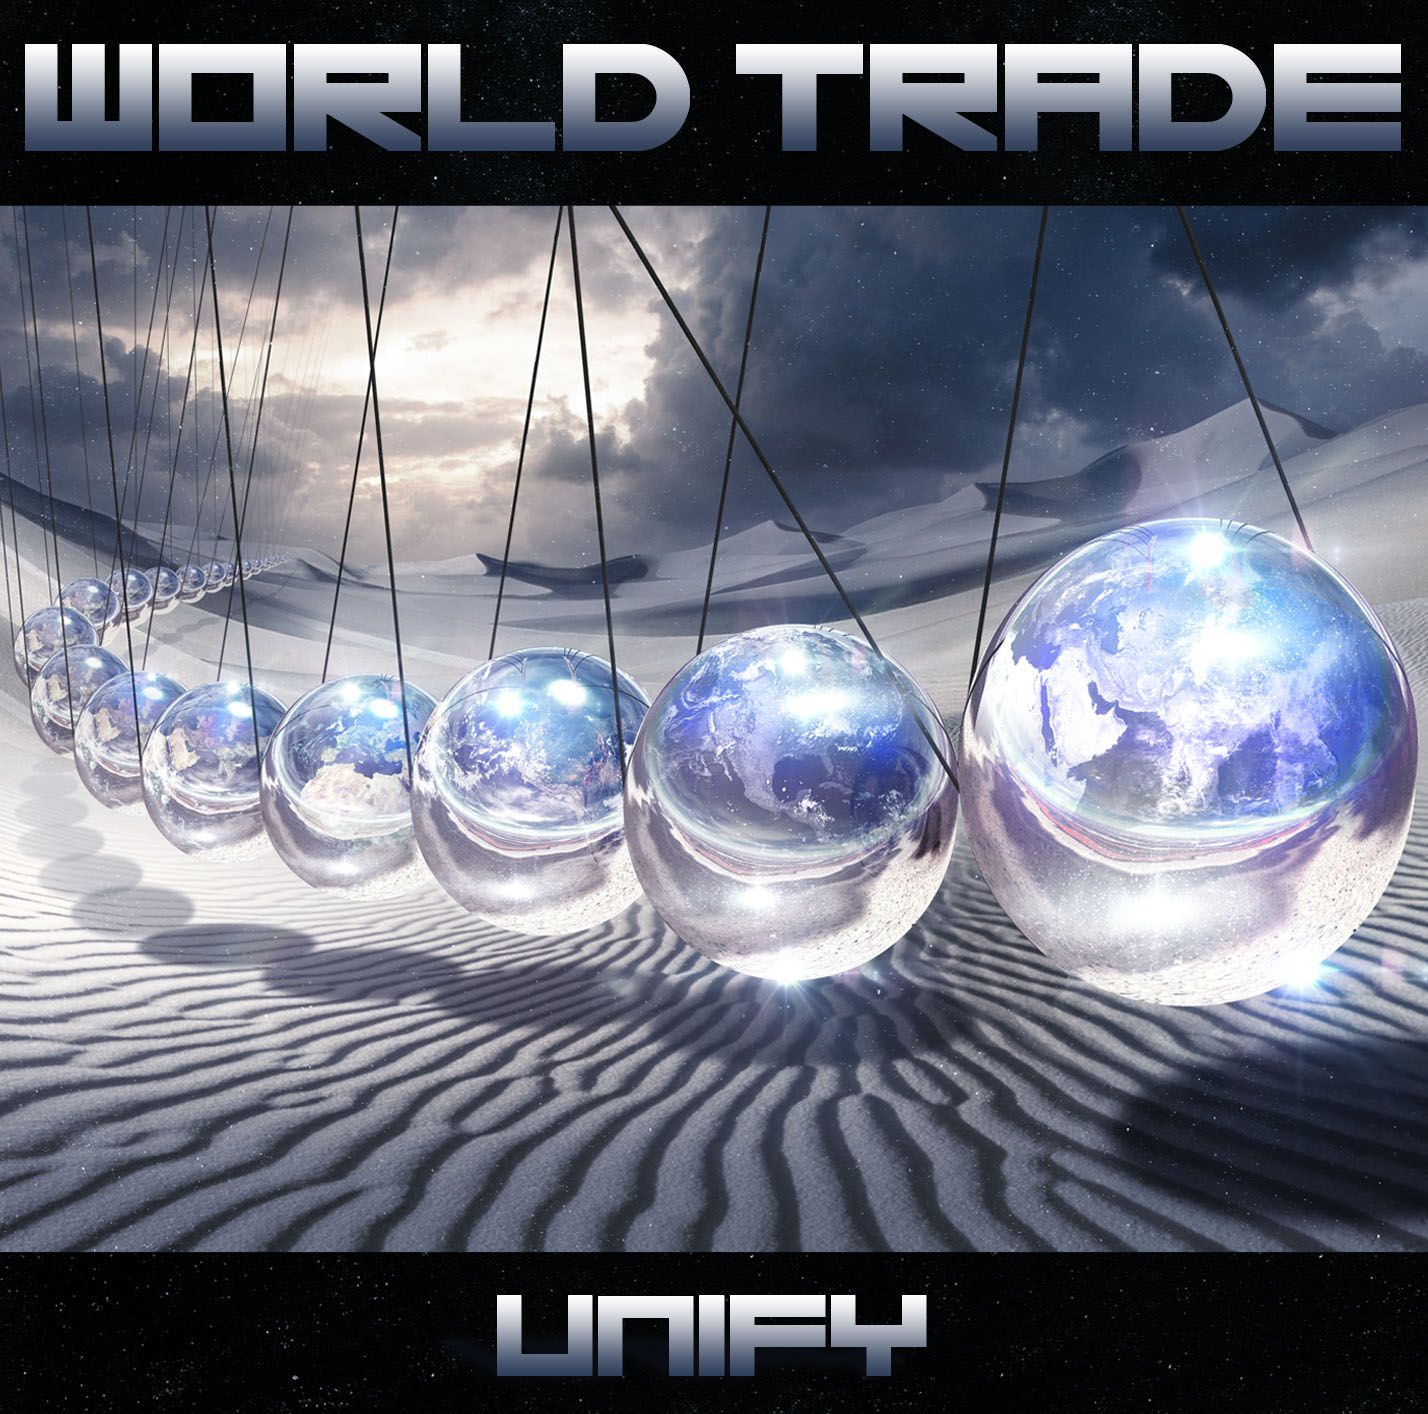 world trade unify